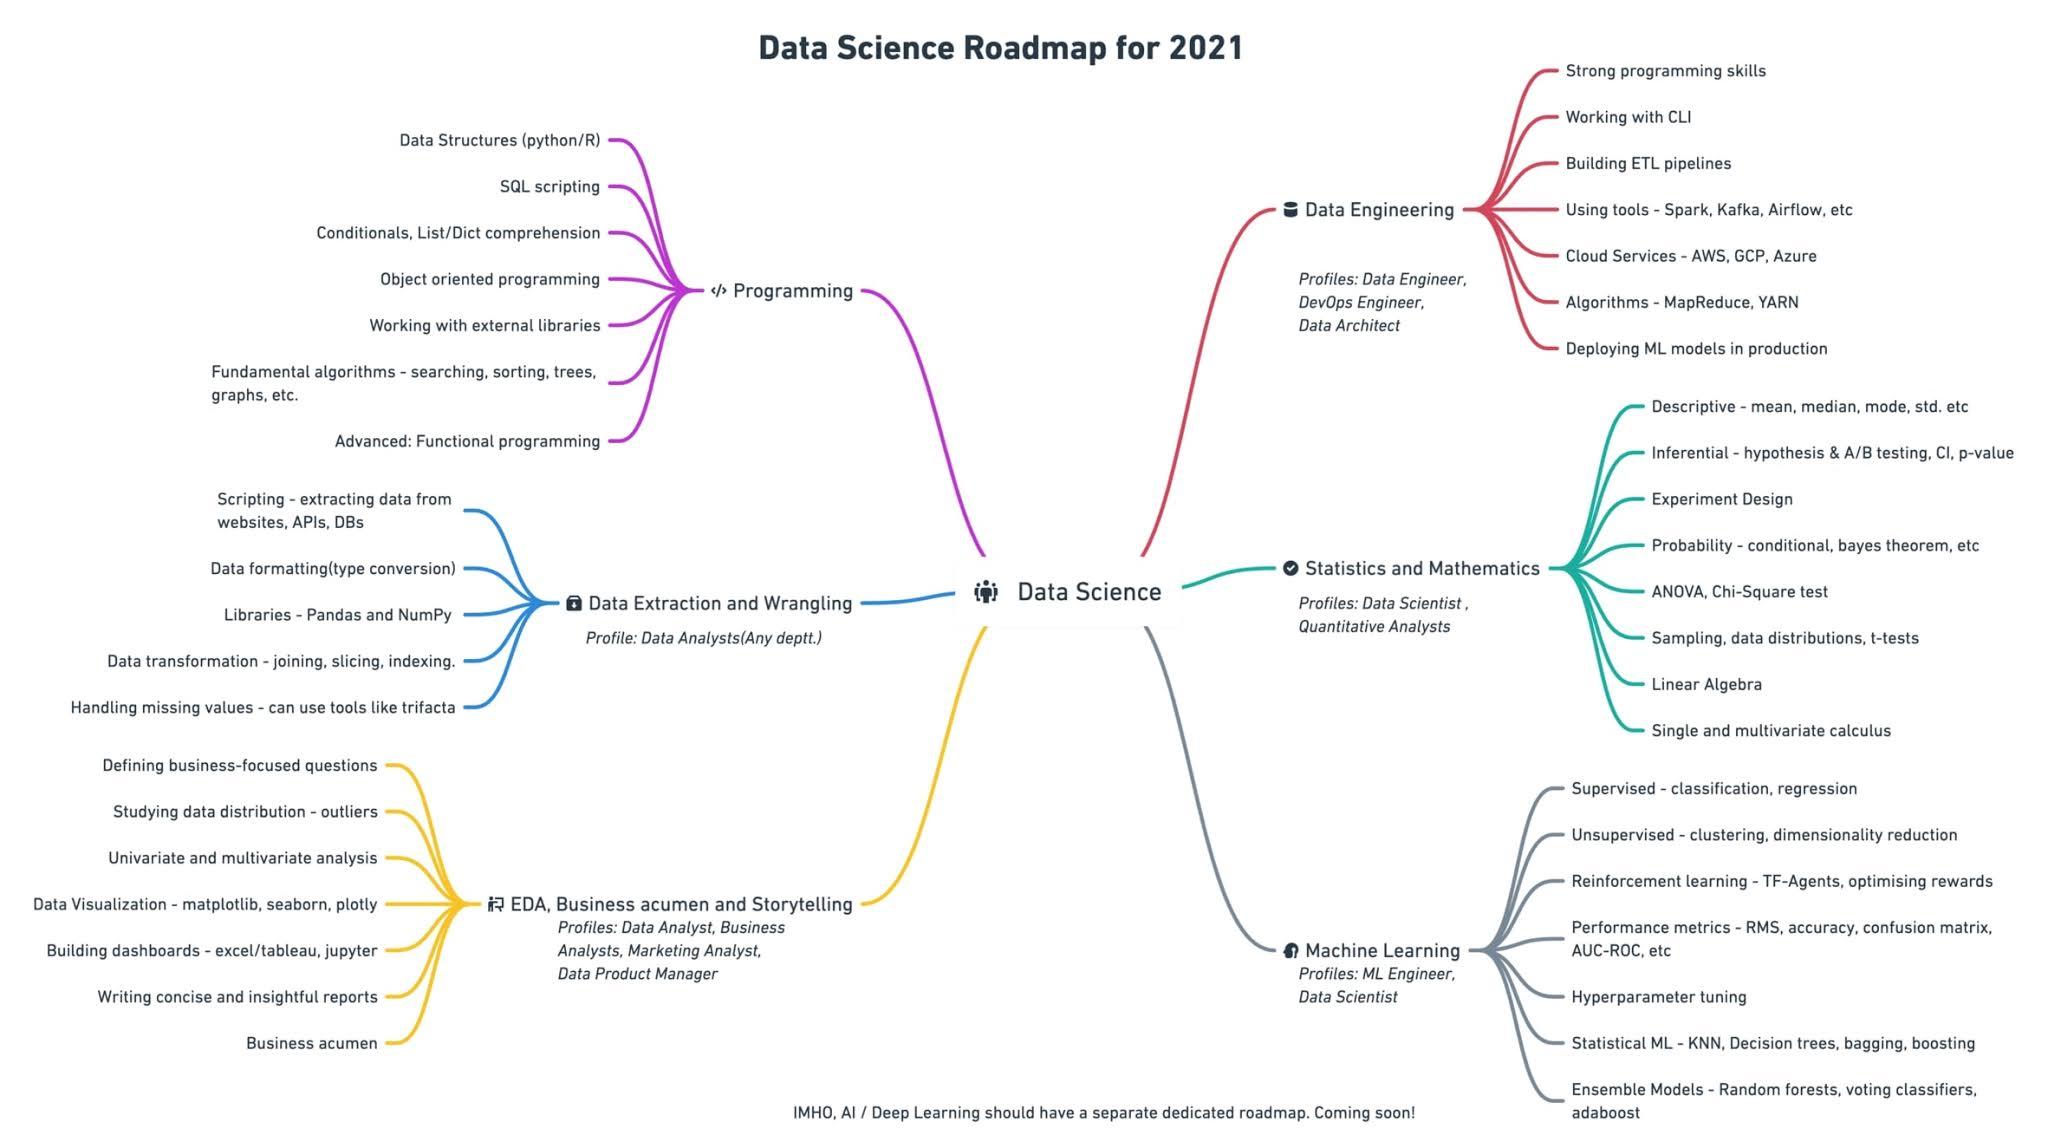 2021 Data Science Roadmap